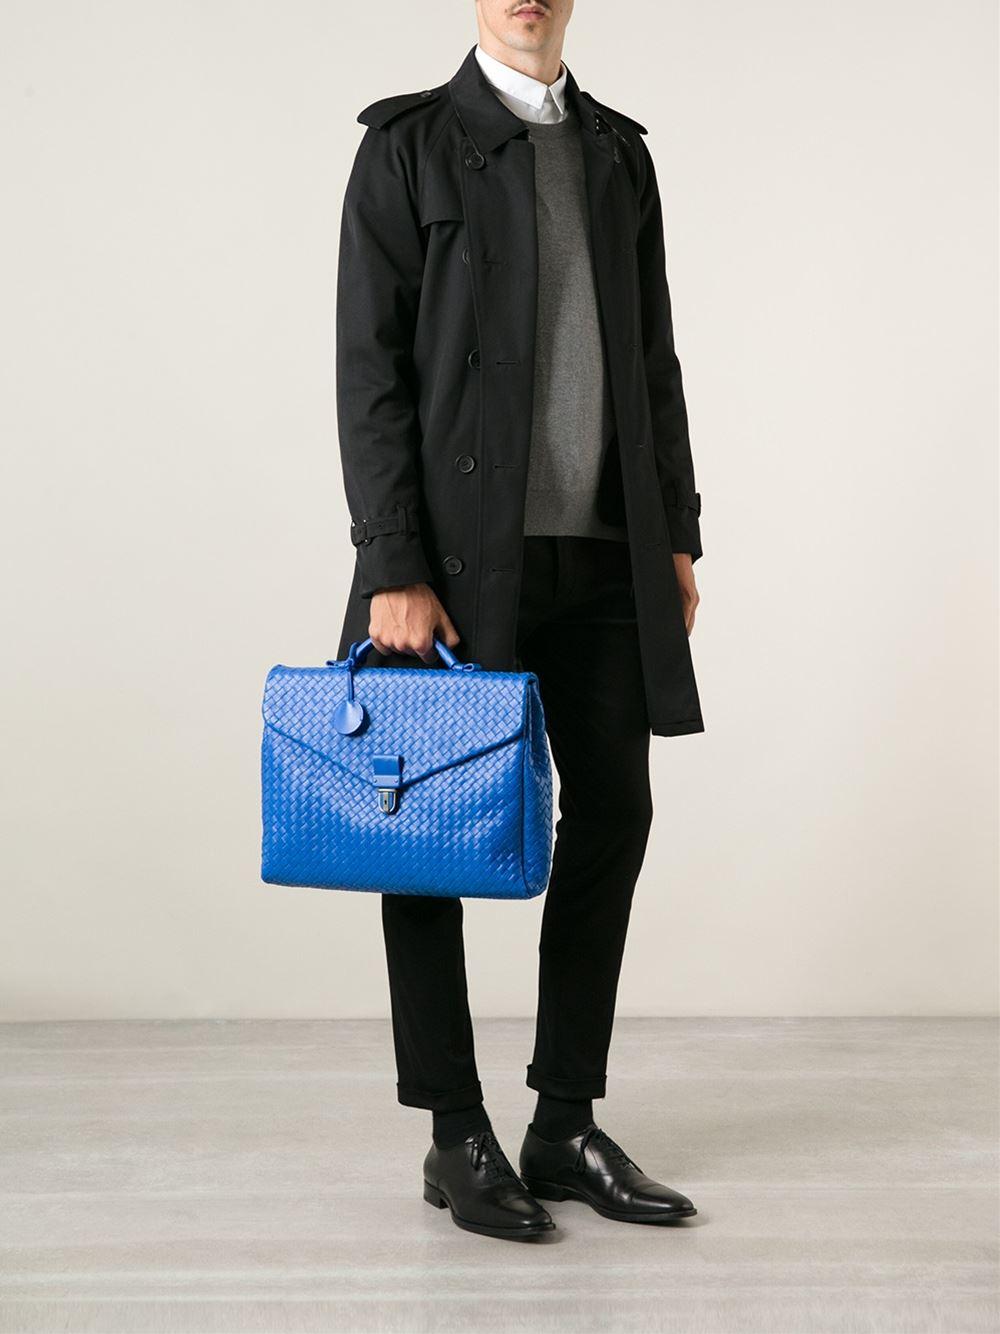 Lyst Bottega Veneta Intrecciato Briefcase In Blue For Men